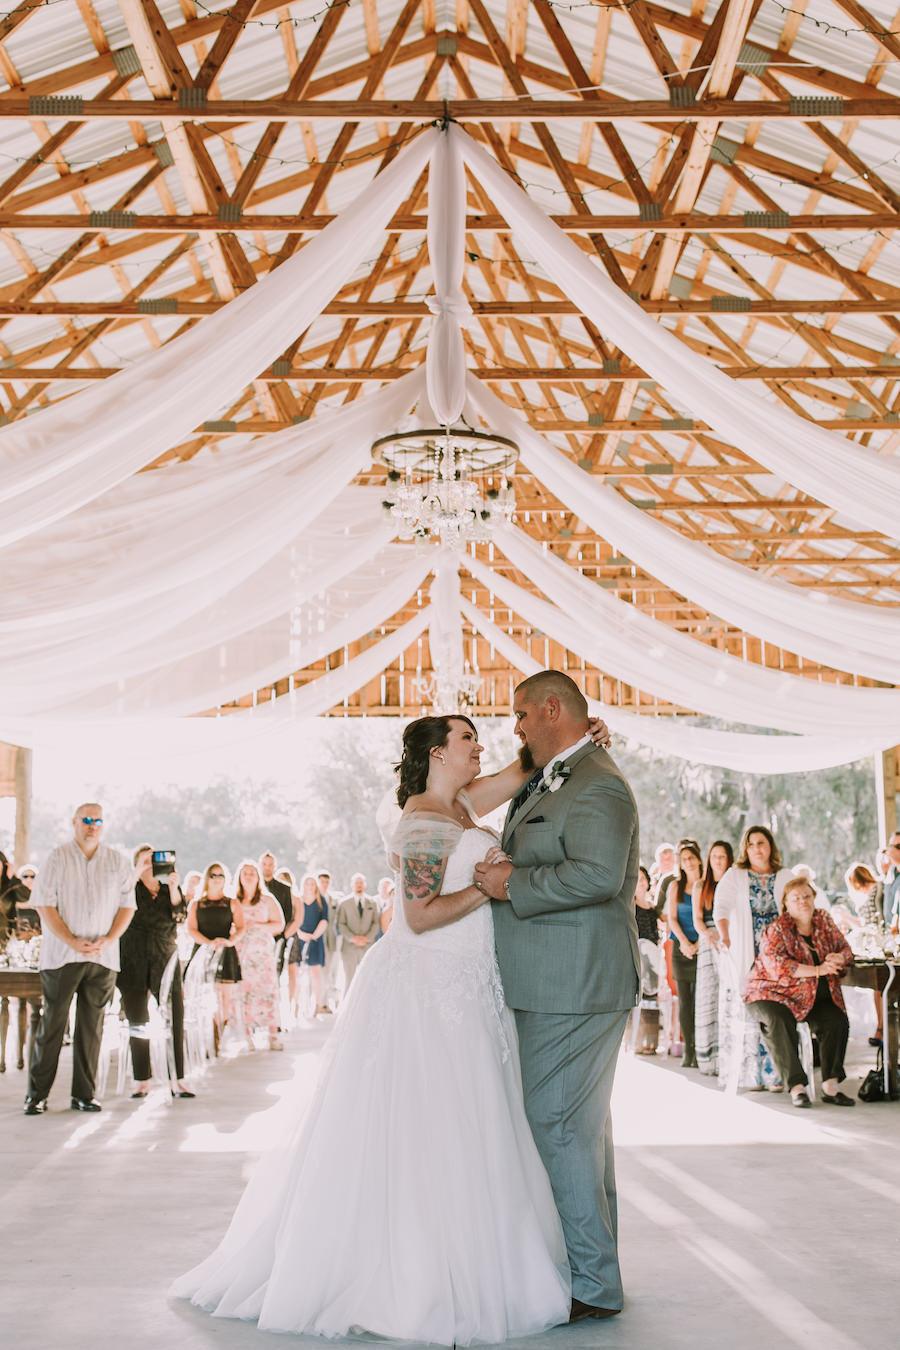 Outdoor Sarasota Barn Wedding Reception Bride and Groom First Dance Wedding Portrait | Sarasota Wedding Planner Jennifer Matteo Event Planning